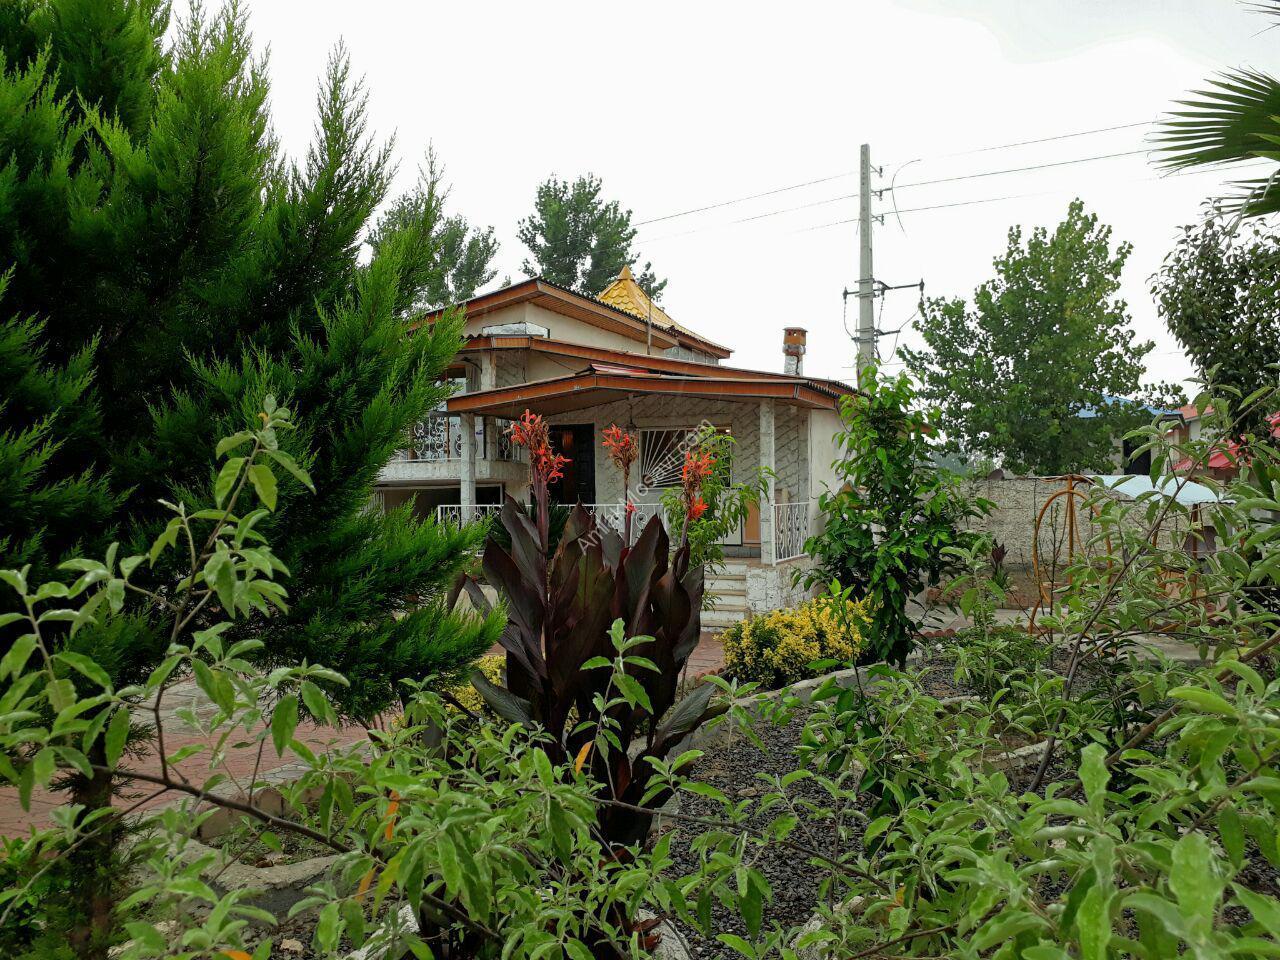 ویلا باغ چمستان | 130 متر مربع